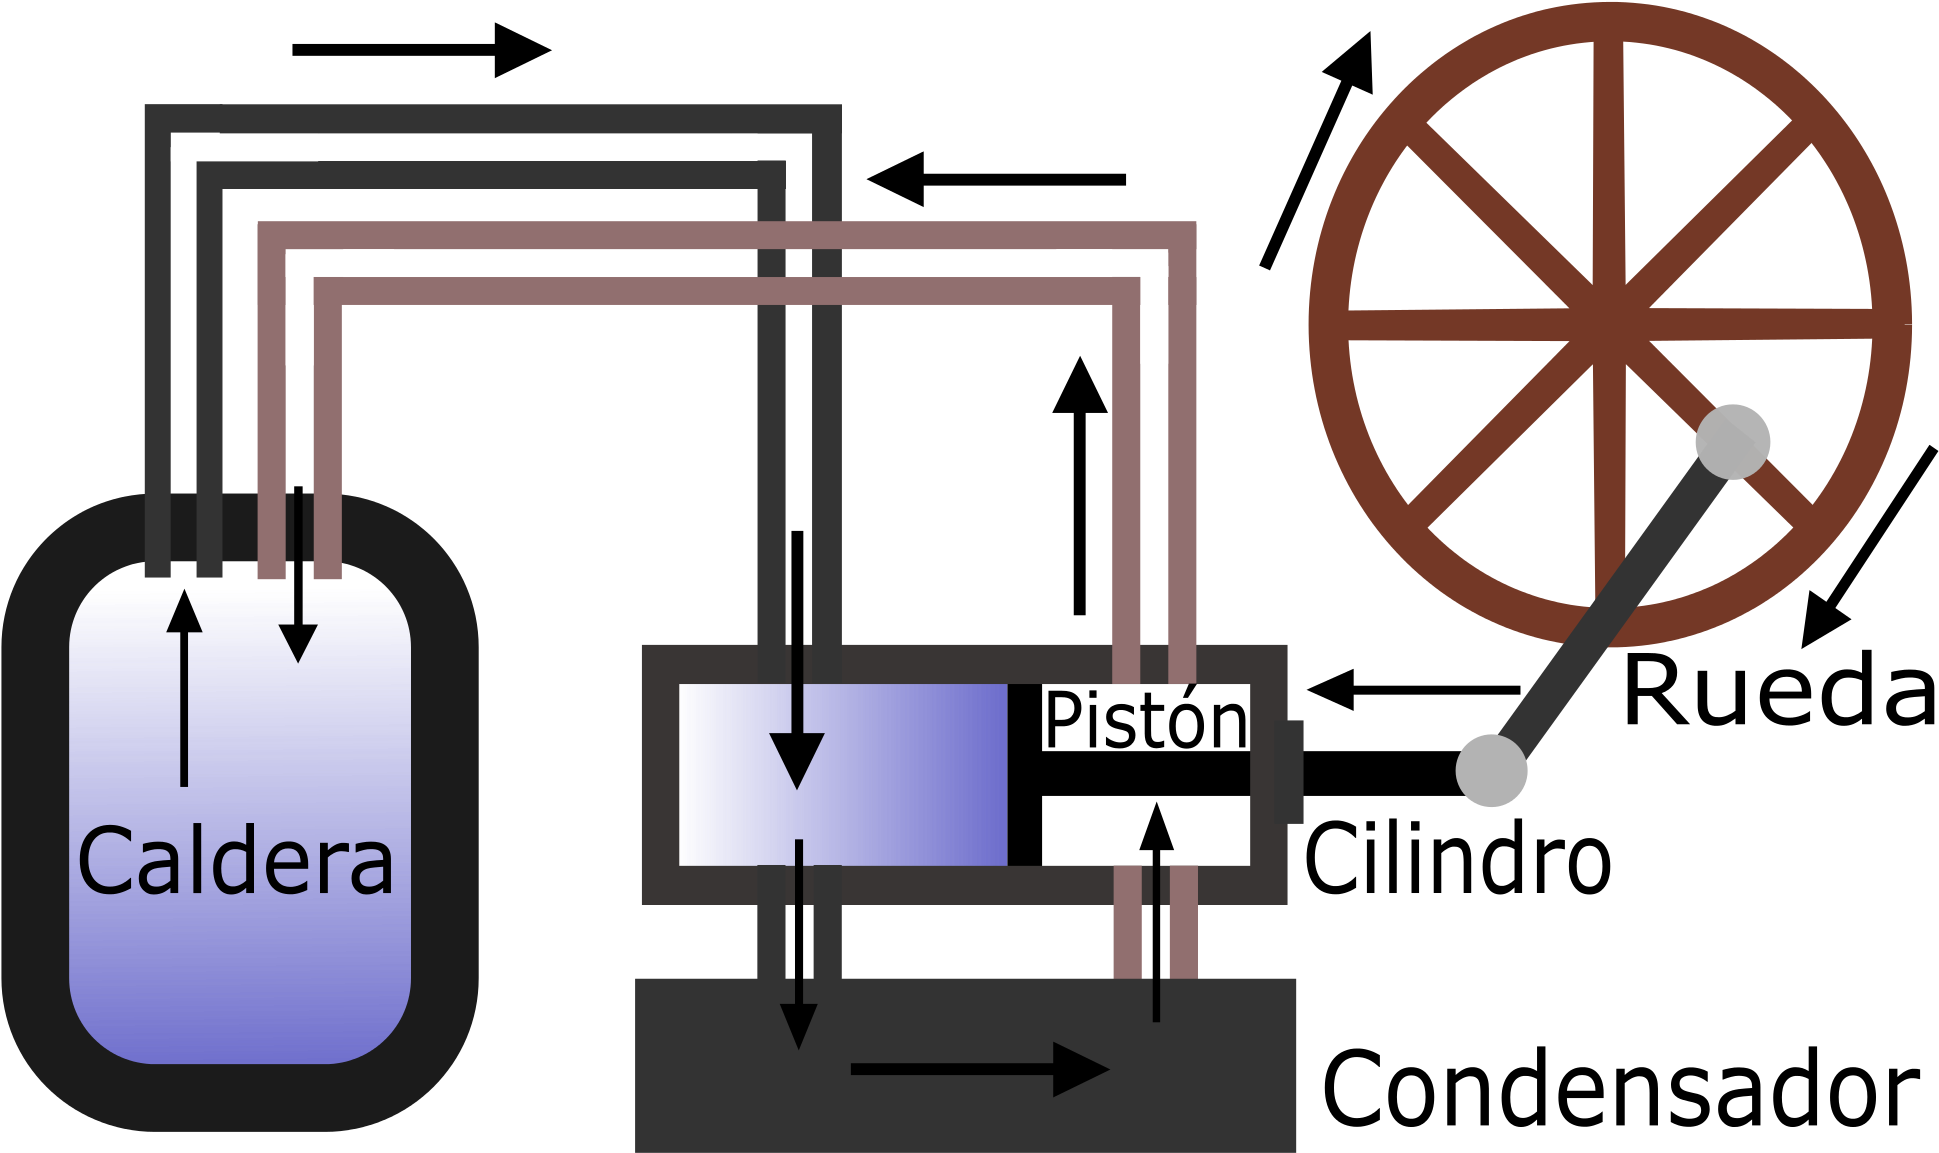 Open - Máquina De Vapor Revolución Industrial (2000x1187), Png Download